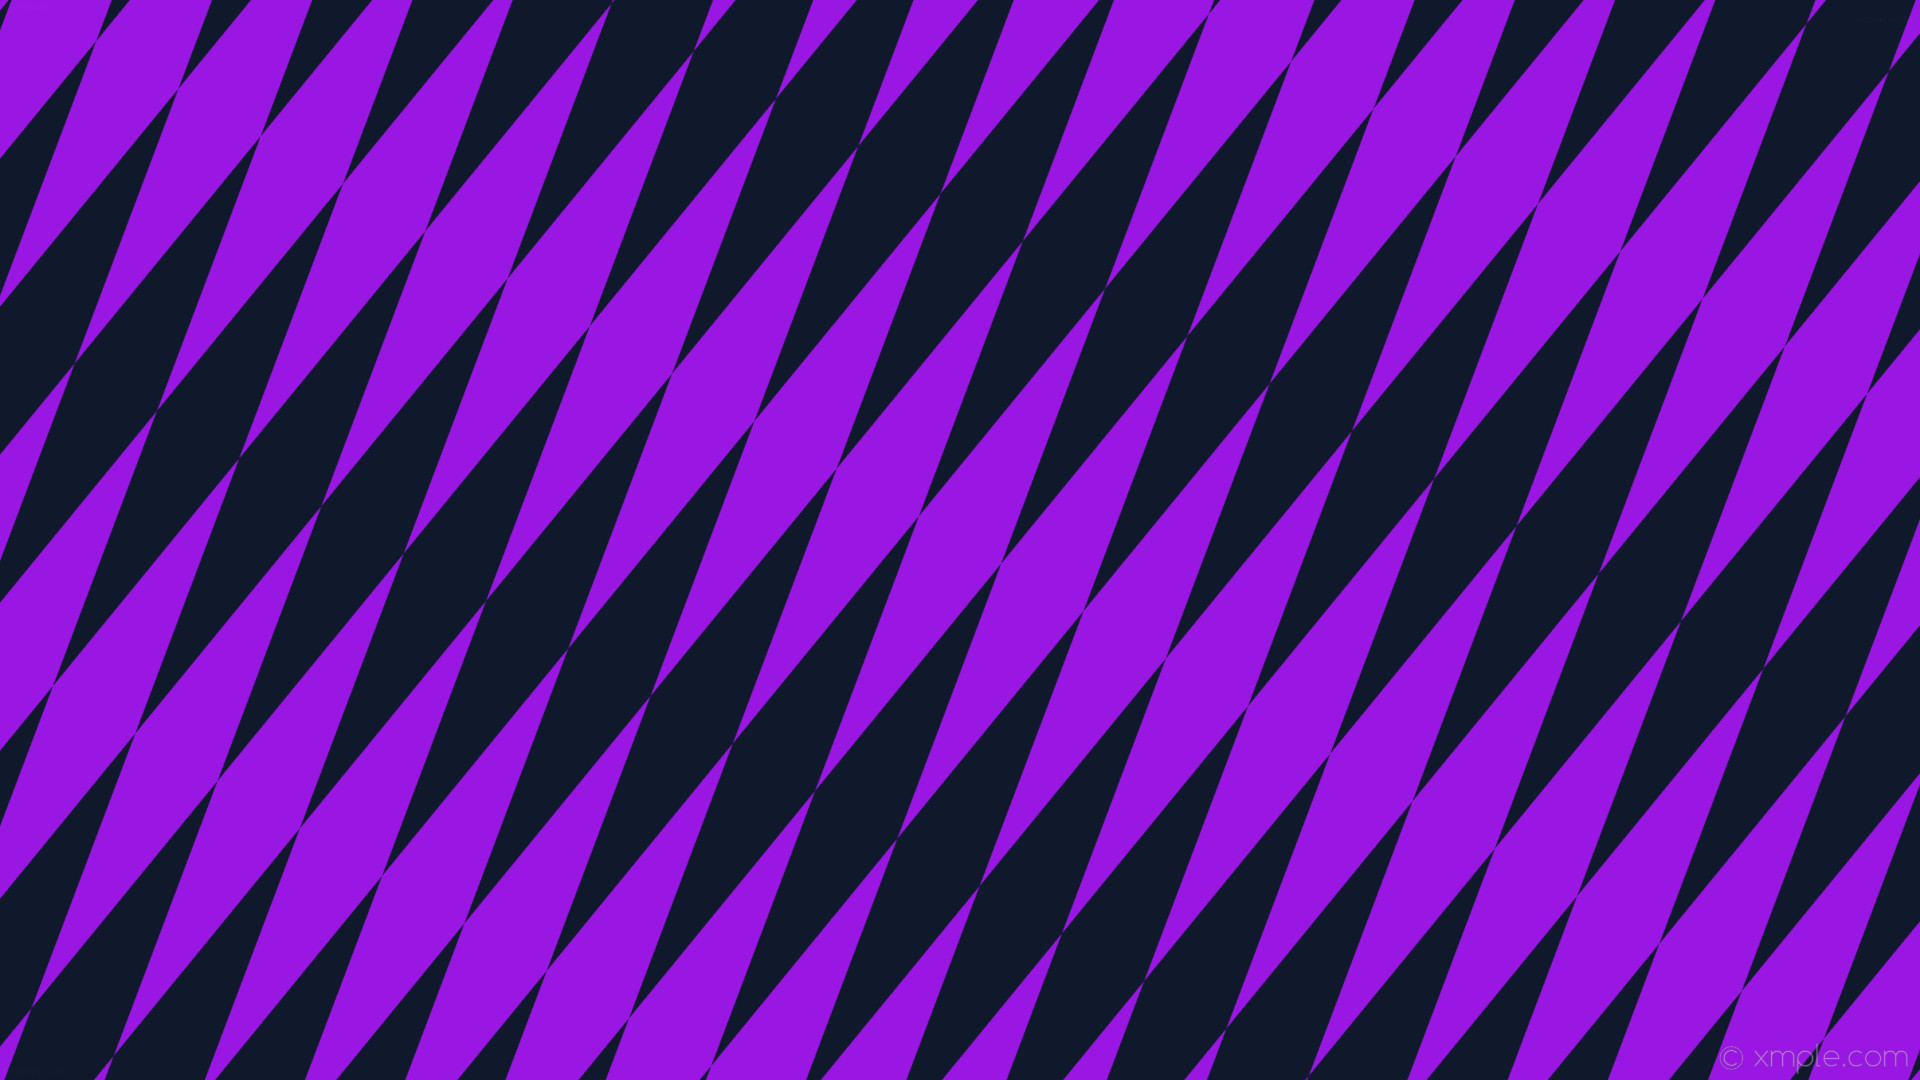 wallpaper rhombus diamond lozenge violet azure dark azure #9a17e3 #10182c  60° 580px 95px